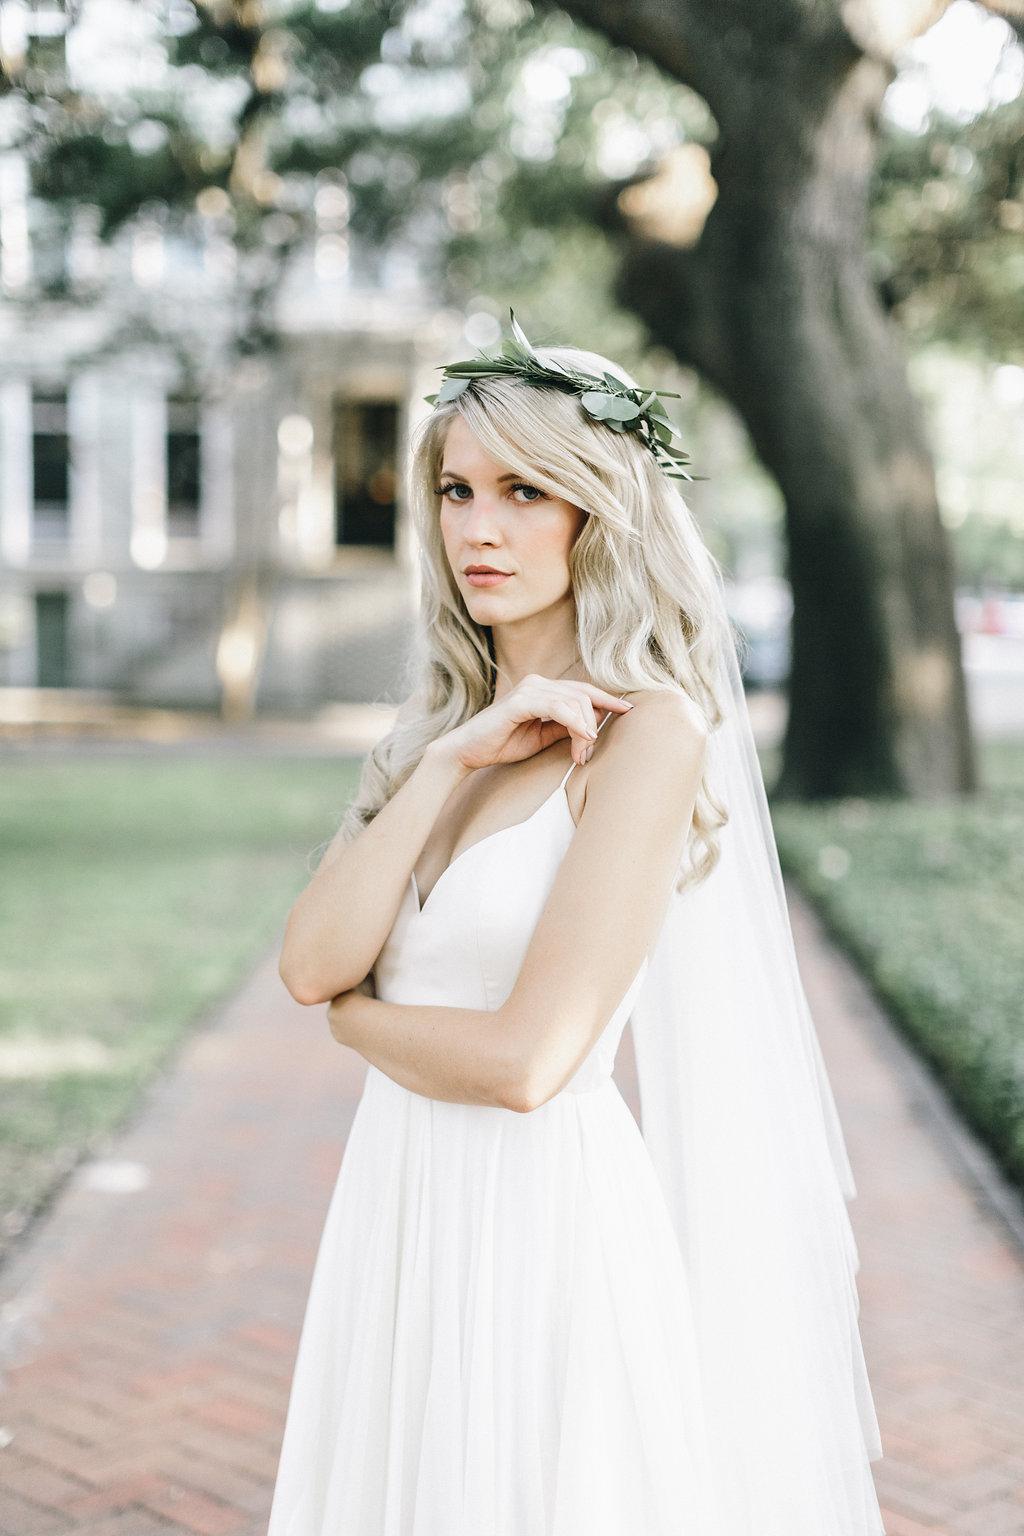 shannon-britt-mackensey-alexander-photography-green-wedding-shoes-ivory-and-beau-bridal-boutique-savannah-wedding-planner-savannah-bridal-boutique-savannah-wedding-dresses-savannah-florist-summer-solstice-wedding-boho-soho-south-cafe-wedding-30.jpg